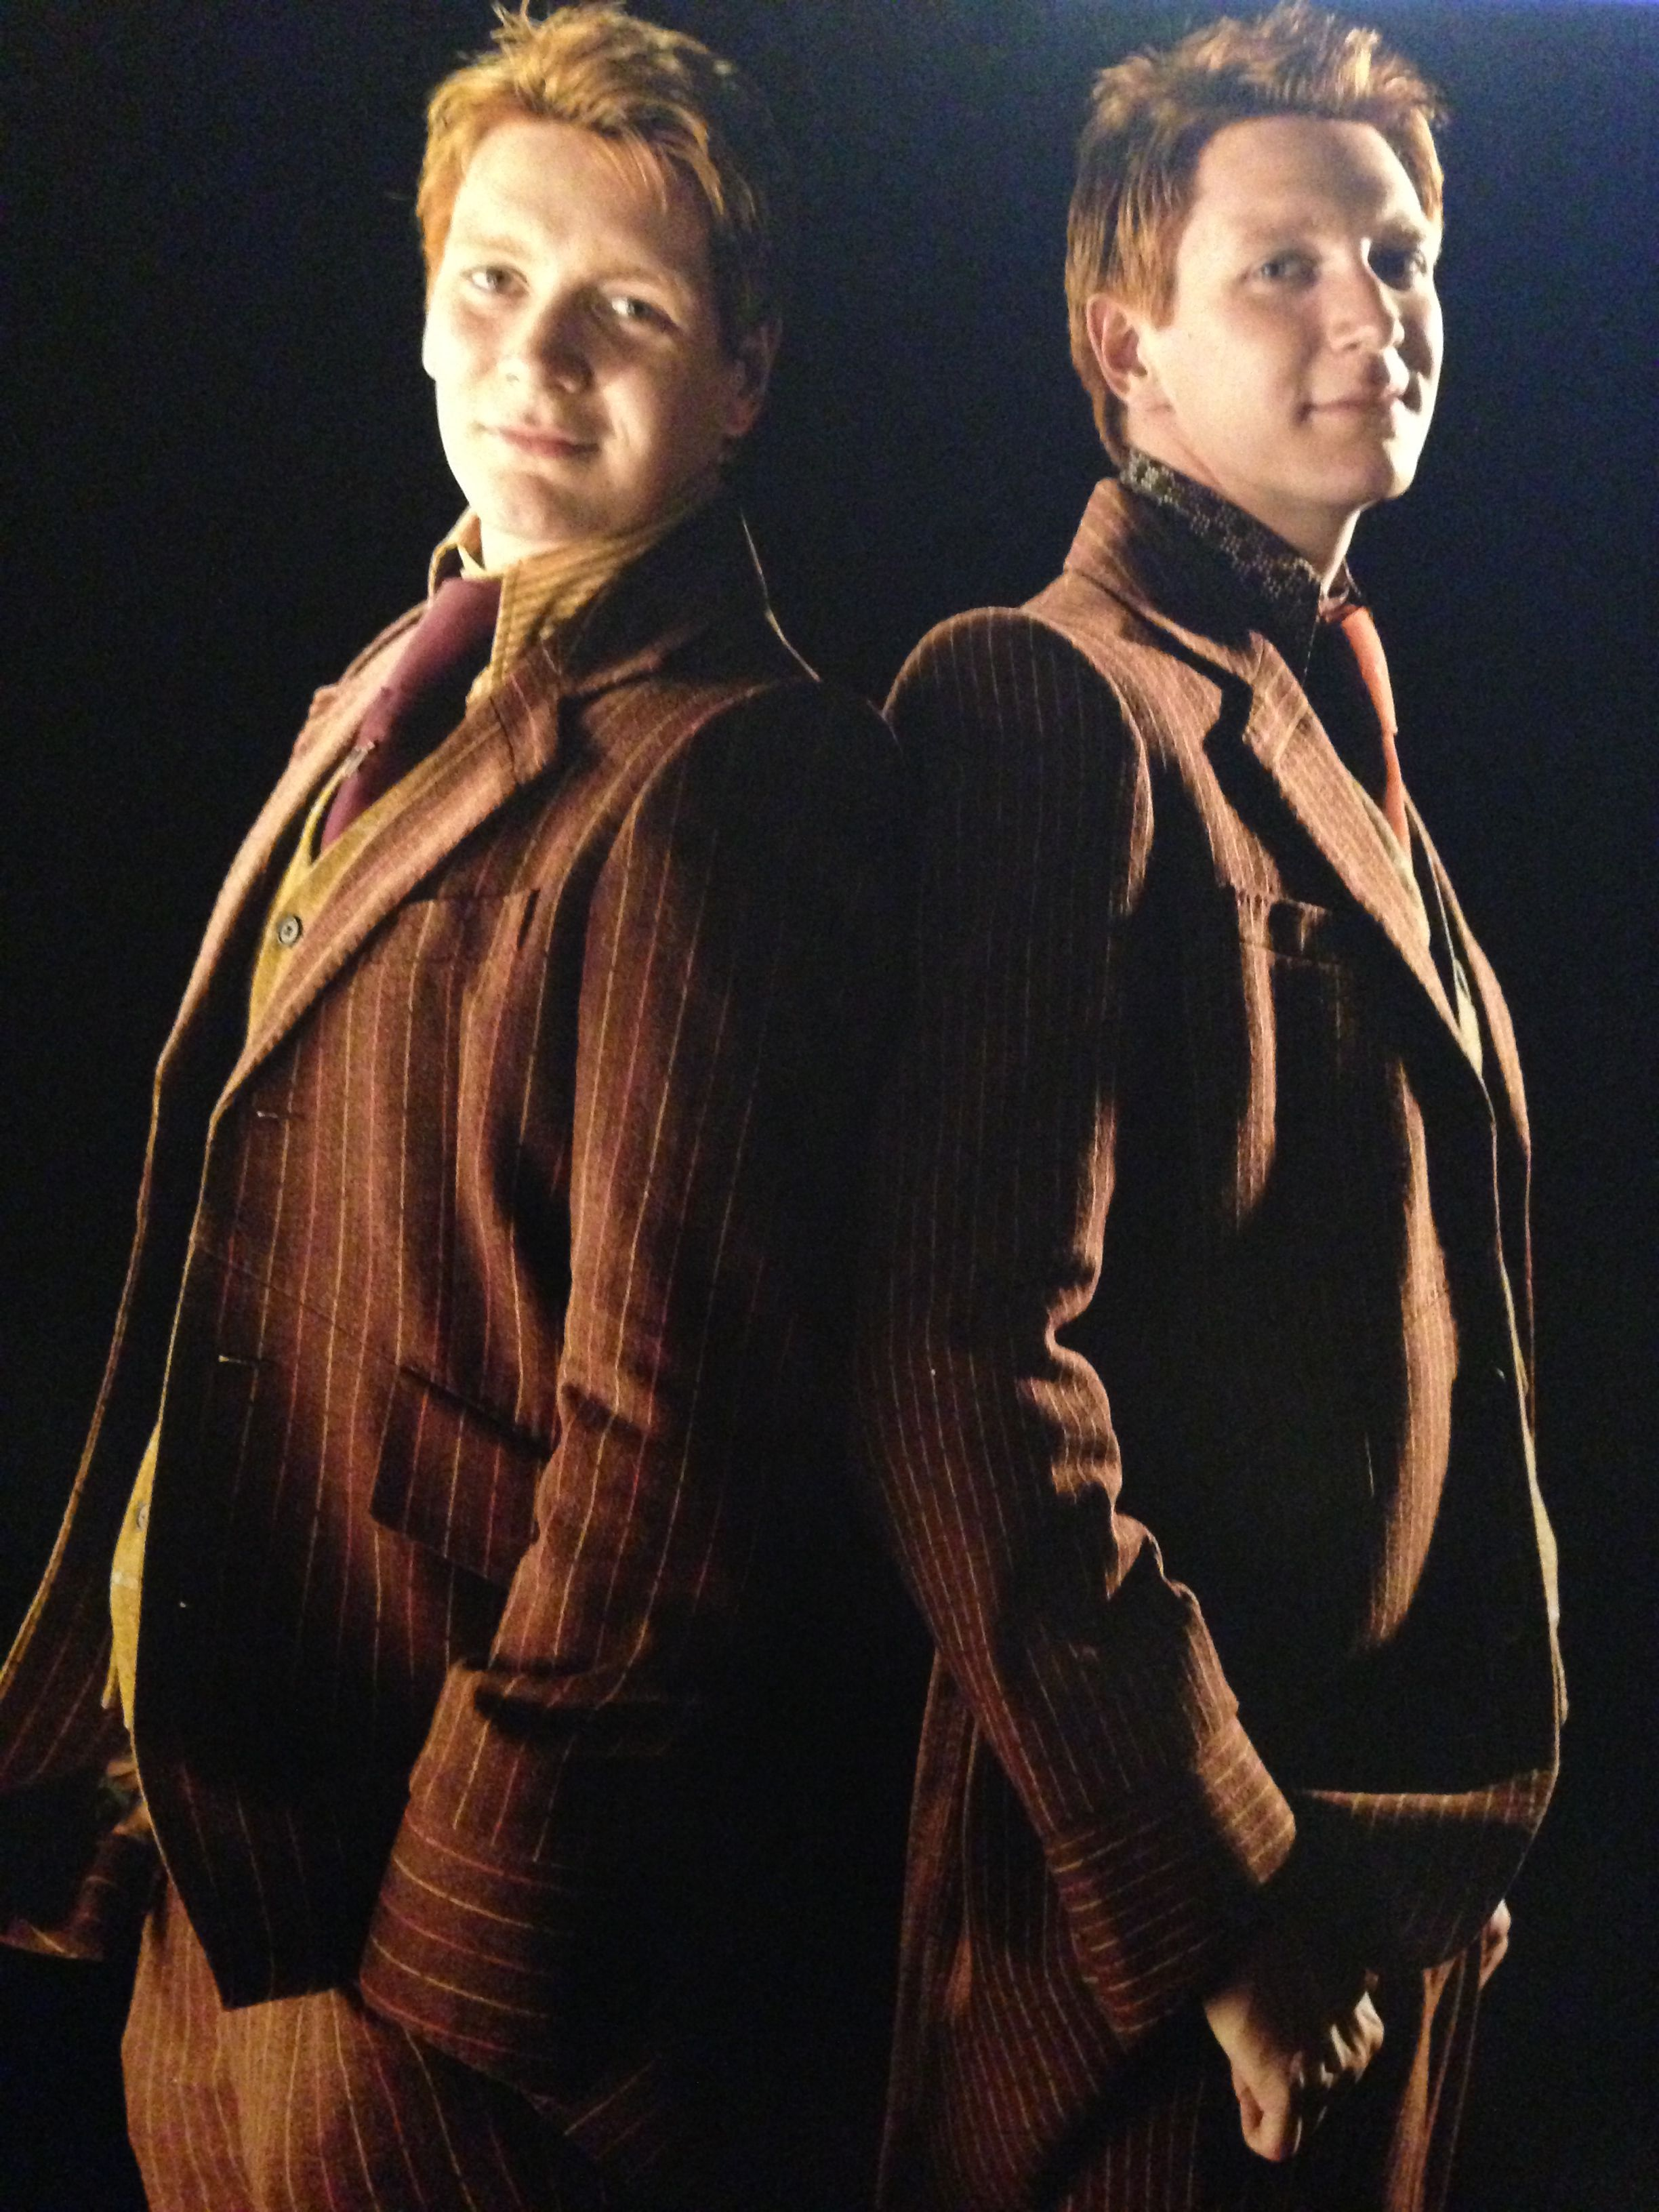 The Twins Fred And George Weasley George Weasley Percy Weasley